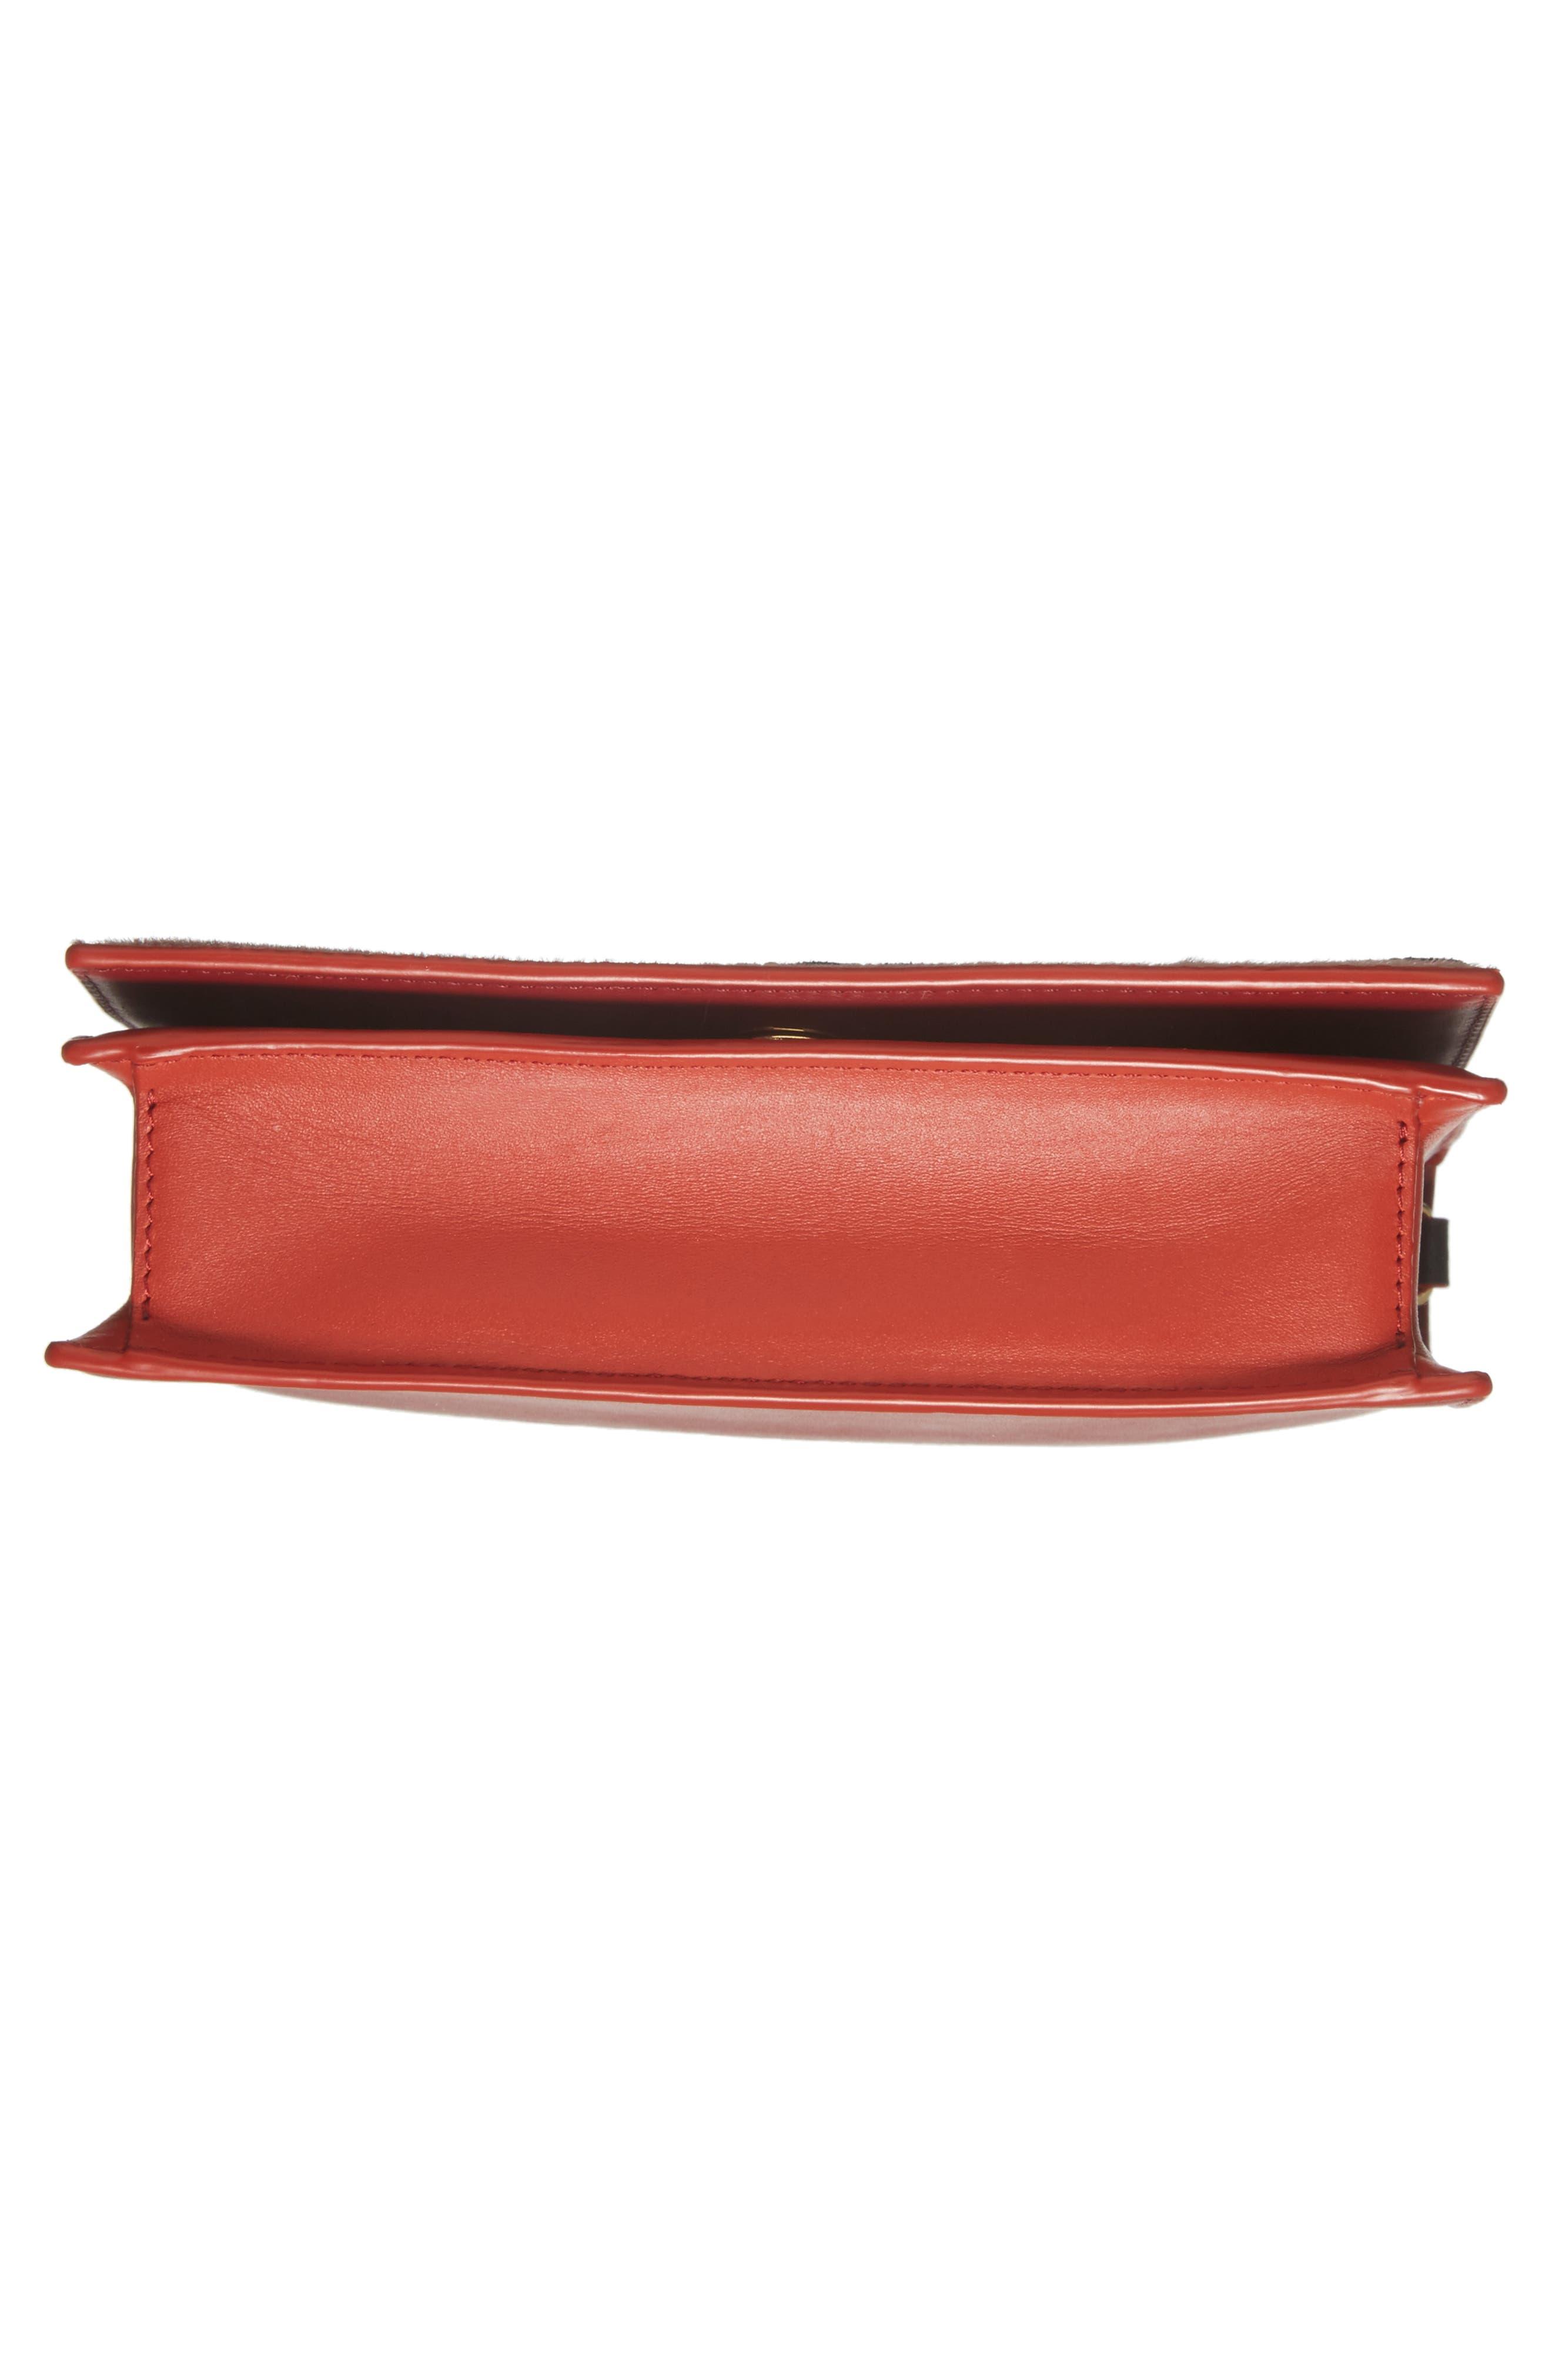 Soirée Genuine Calf Hair & Leather Convertible Shoulder Bag,                             Alternate thumbnail 7, color,                             537